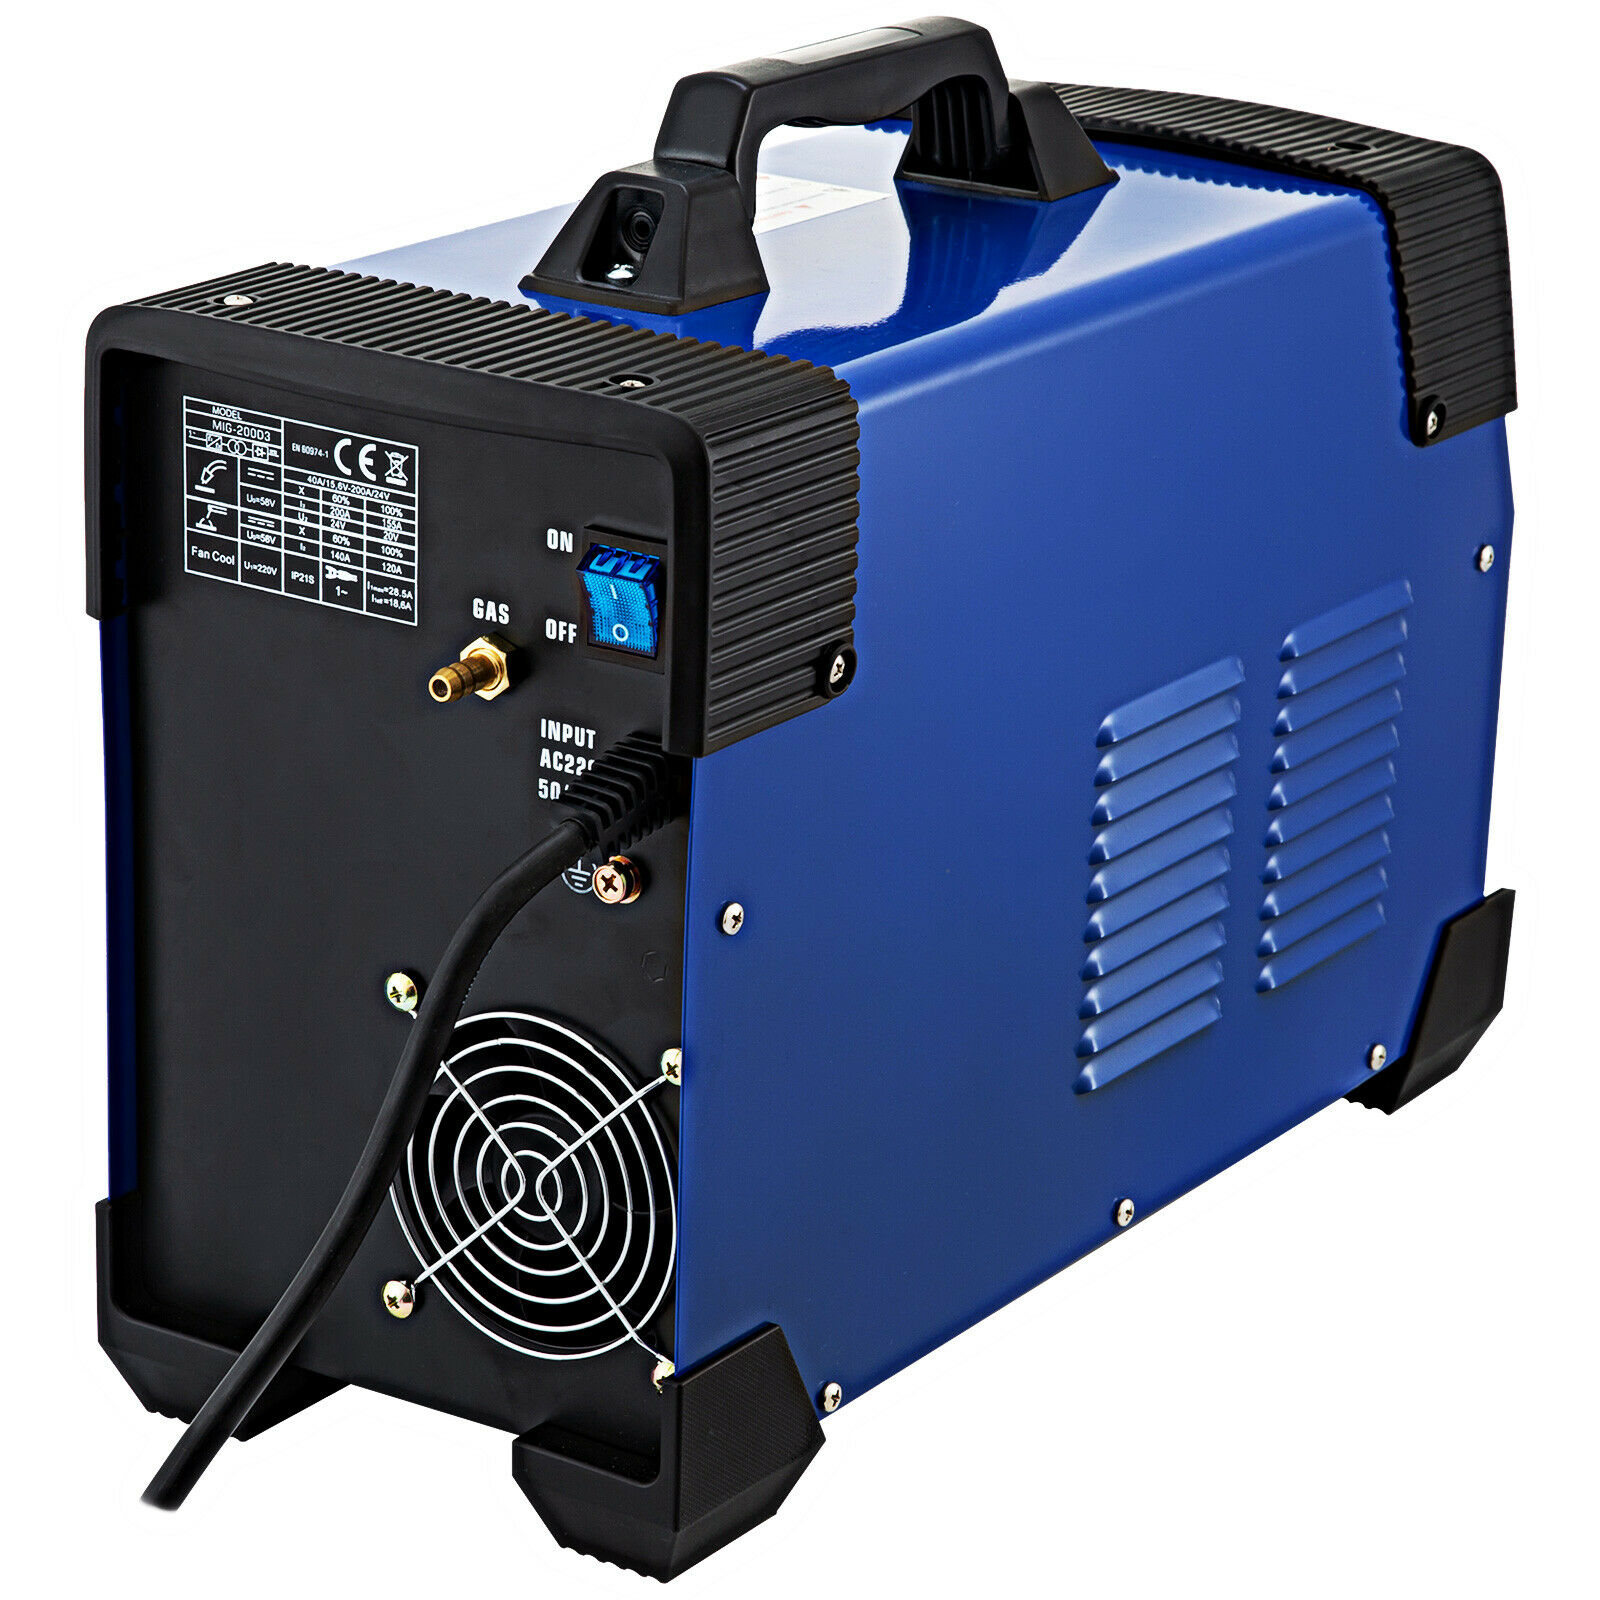 Machine Welding Shipping FCAW Welding MMA 230V Inverter Free TIG MAG EU 200A E Hand MIG Machine For Electrode